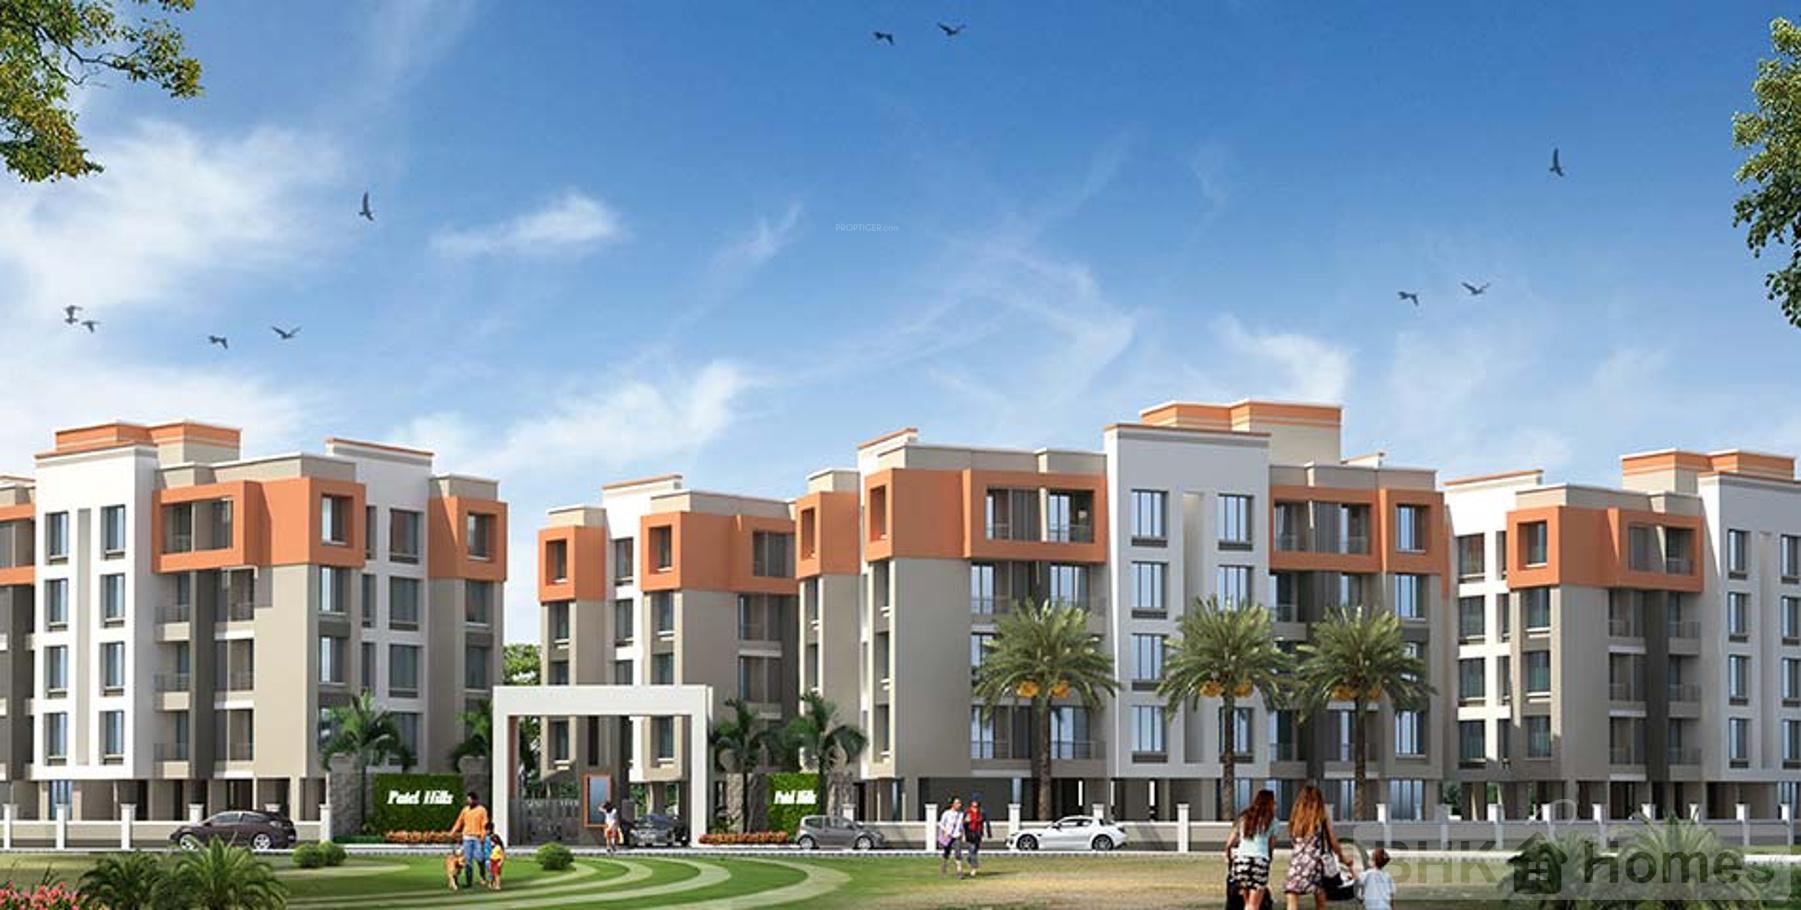 Patel Hills